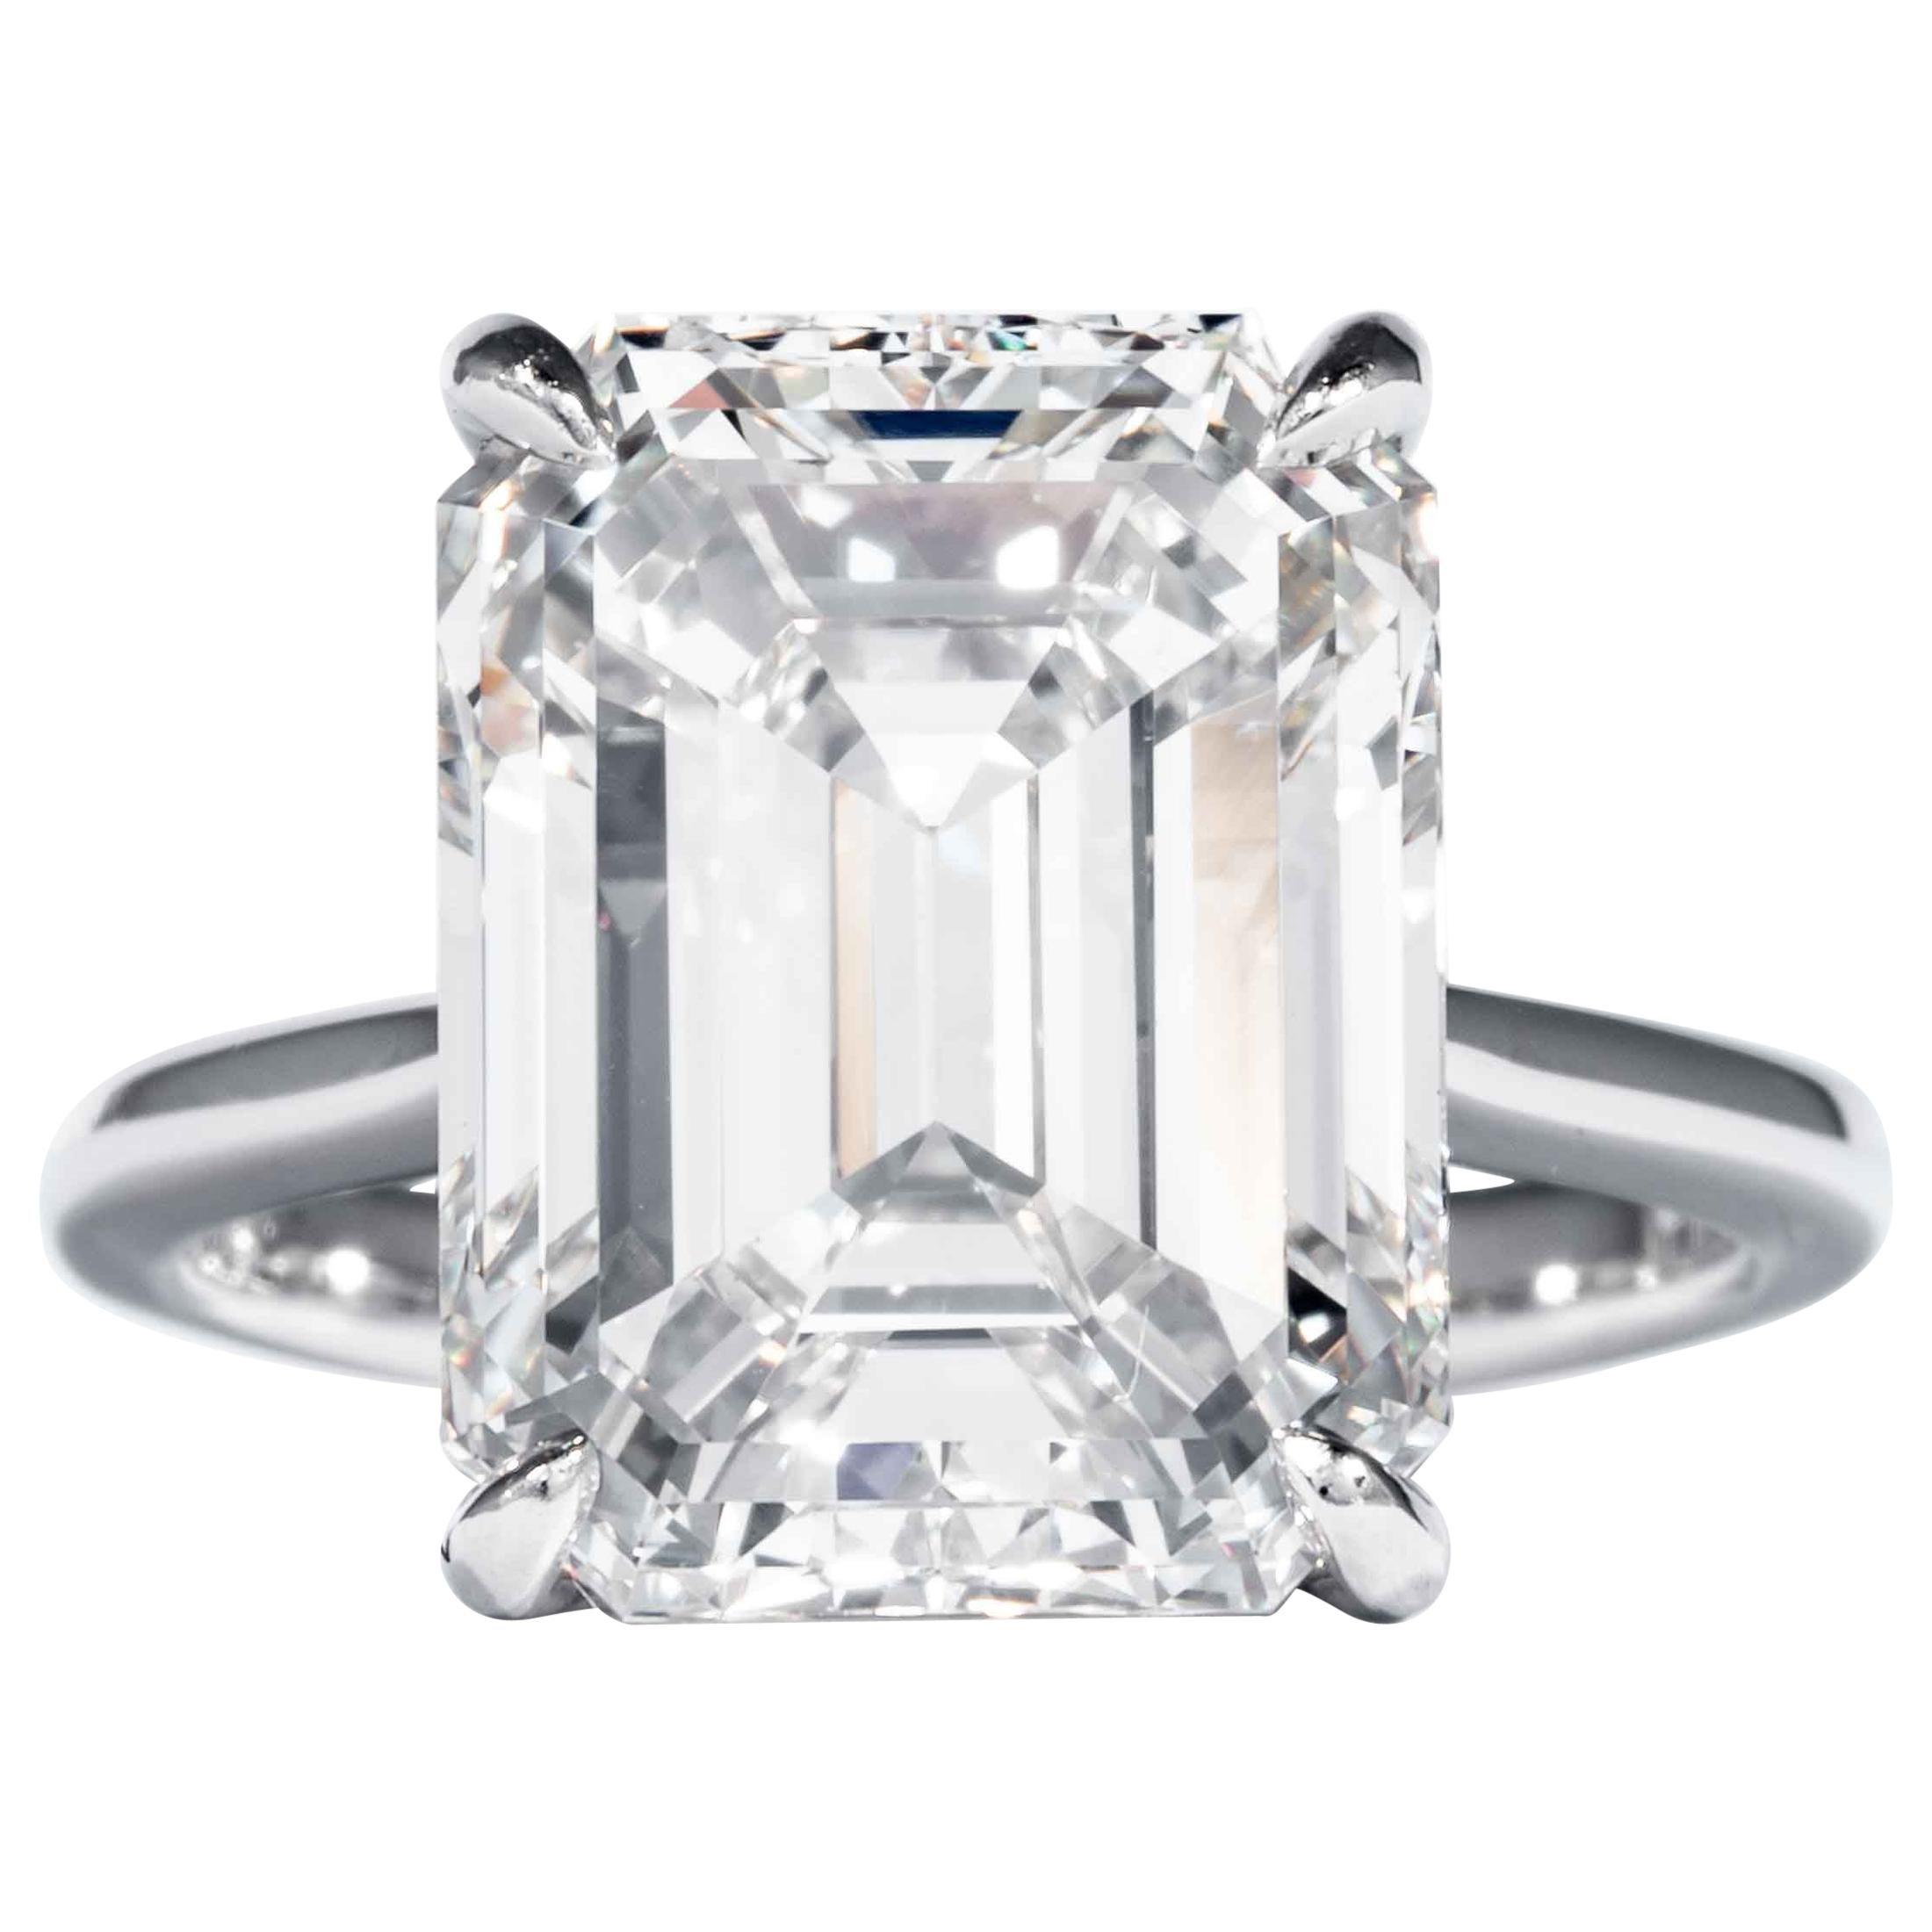 Shreve, Crump & Low GIA Certified 10.21 Carat K VVS2 Emerald Cut Diamond Ring